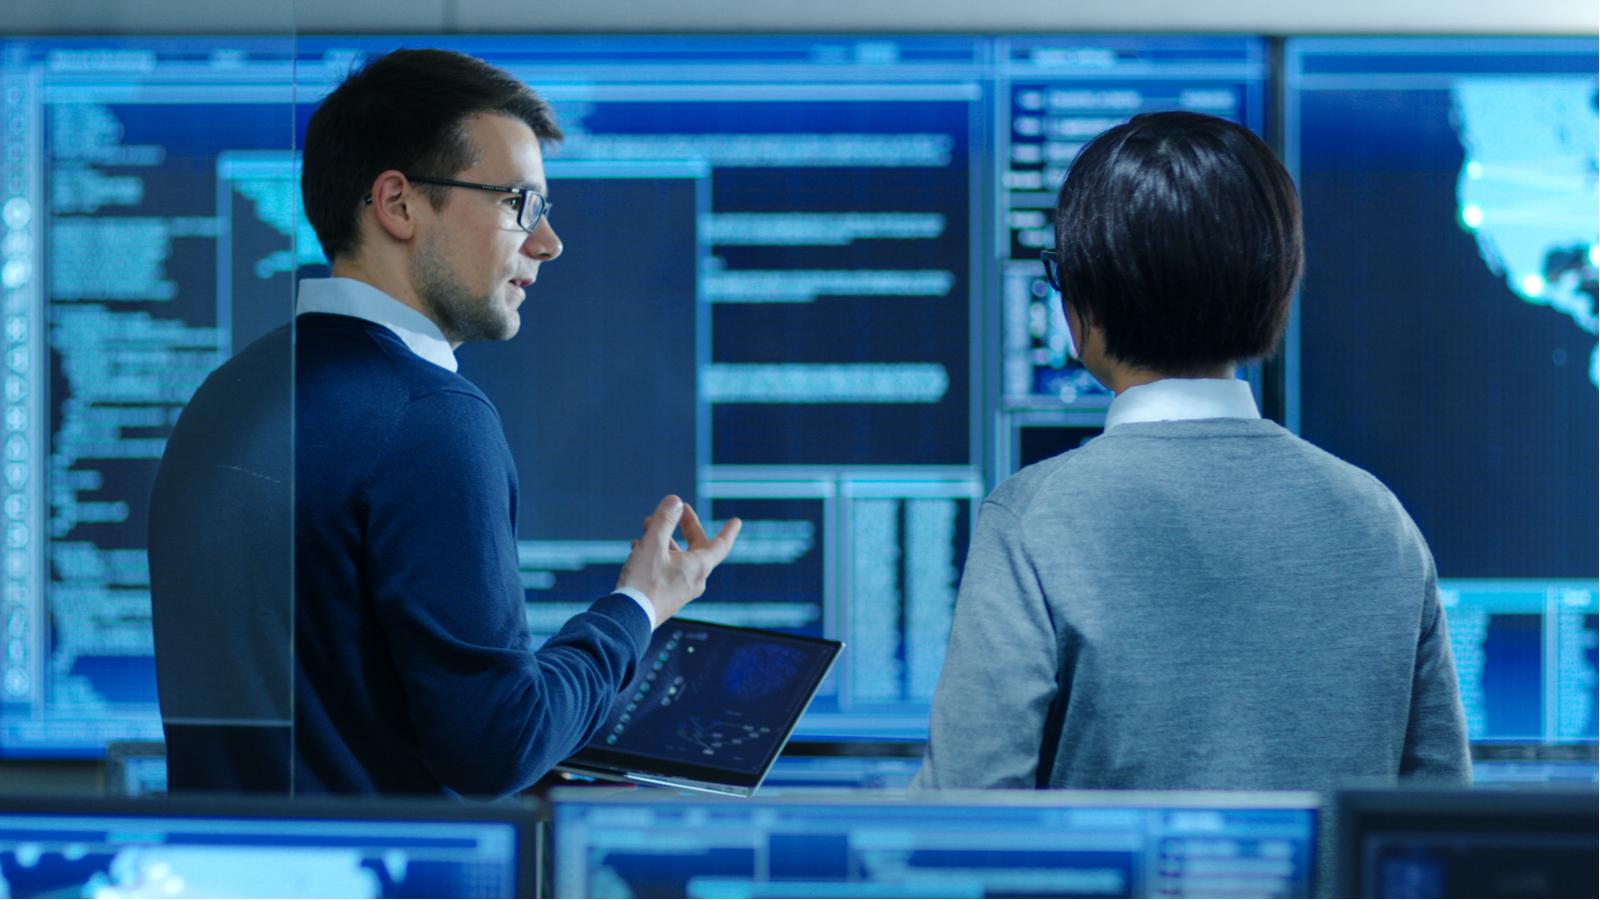 Chief Information Security Officer: perché lo imprese lo devono avere